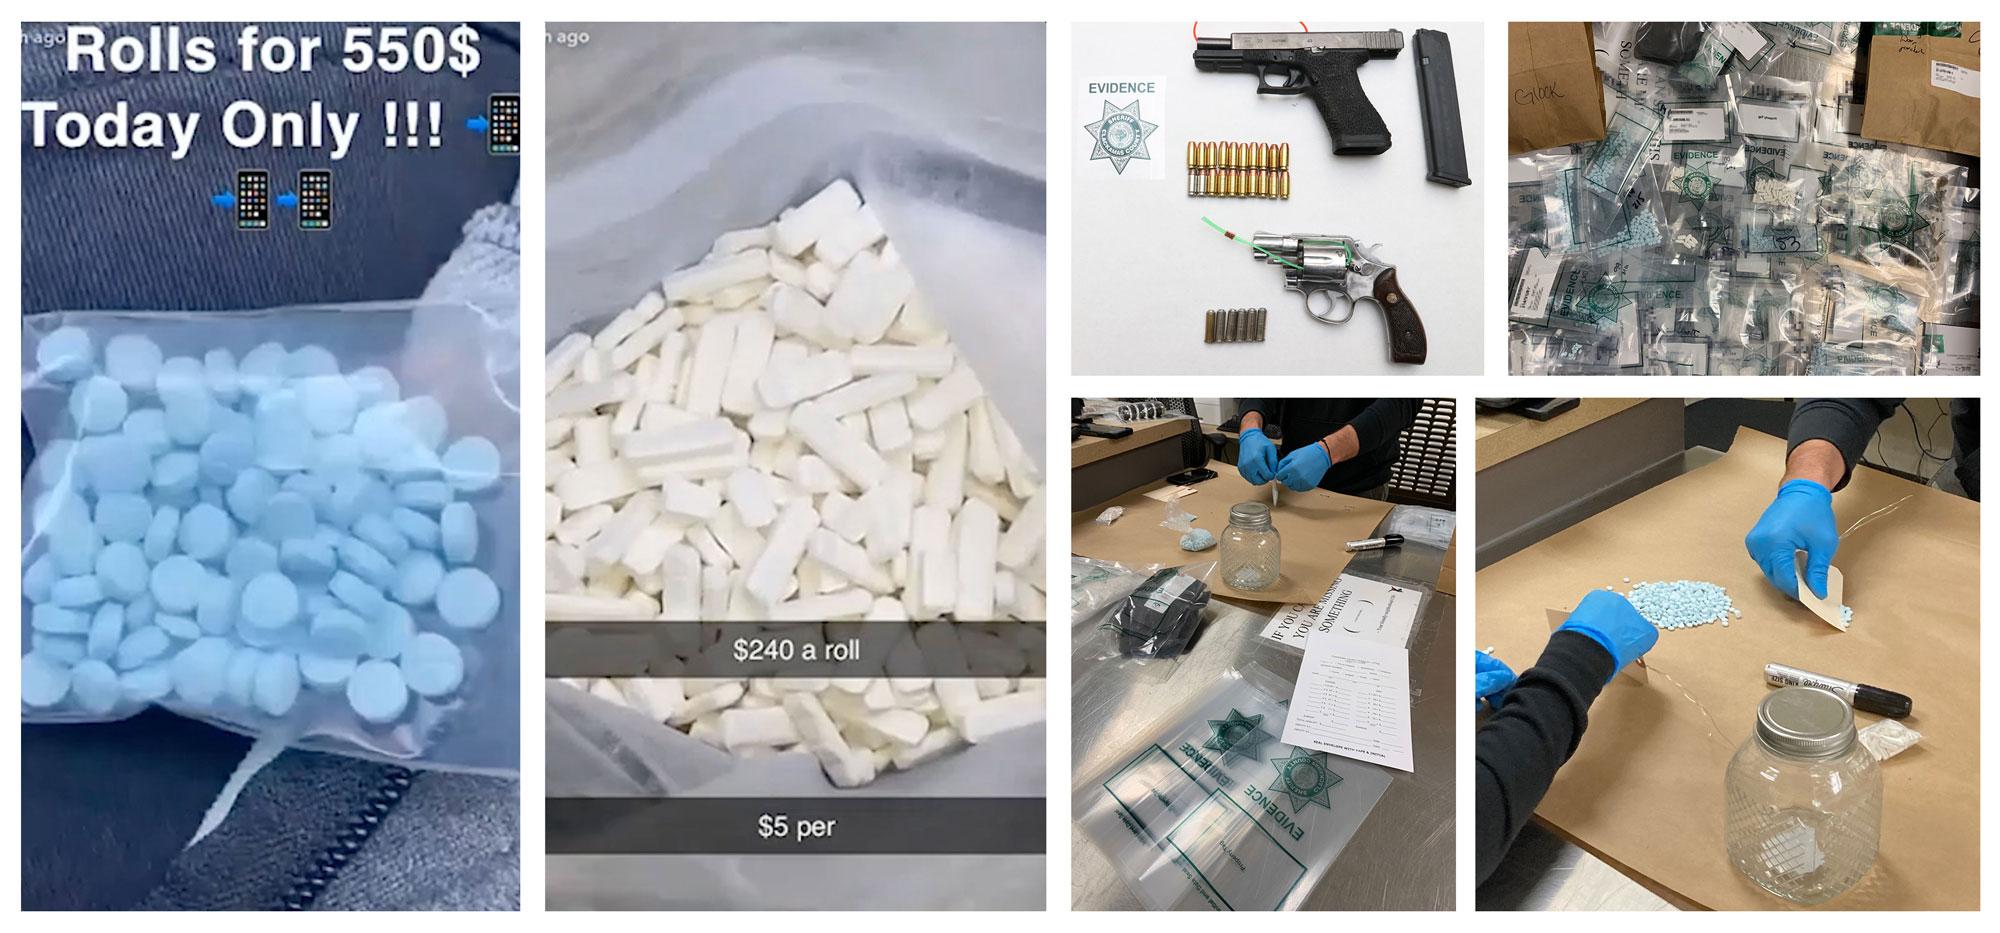 Snapchat pill bust